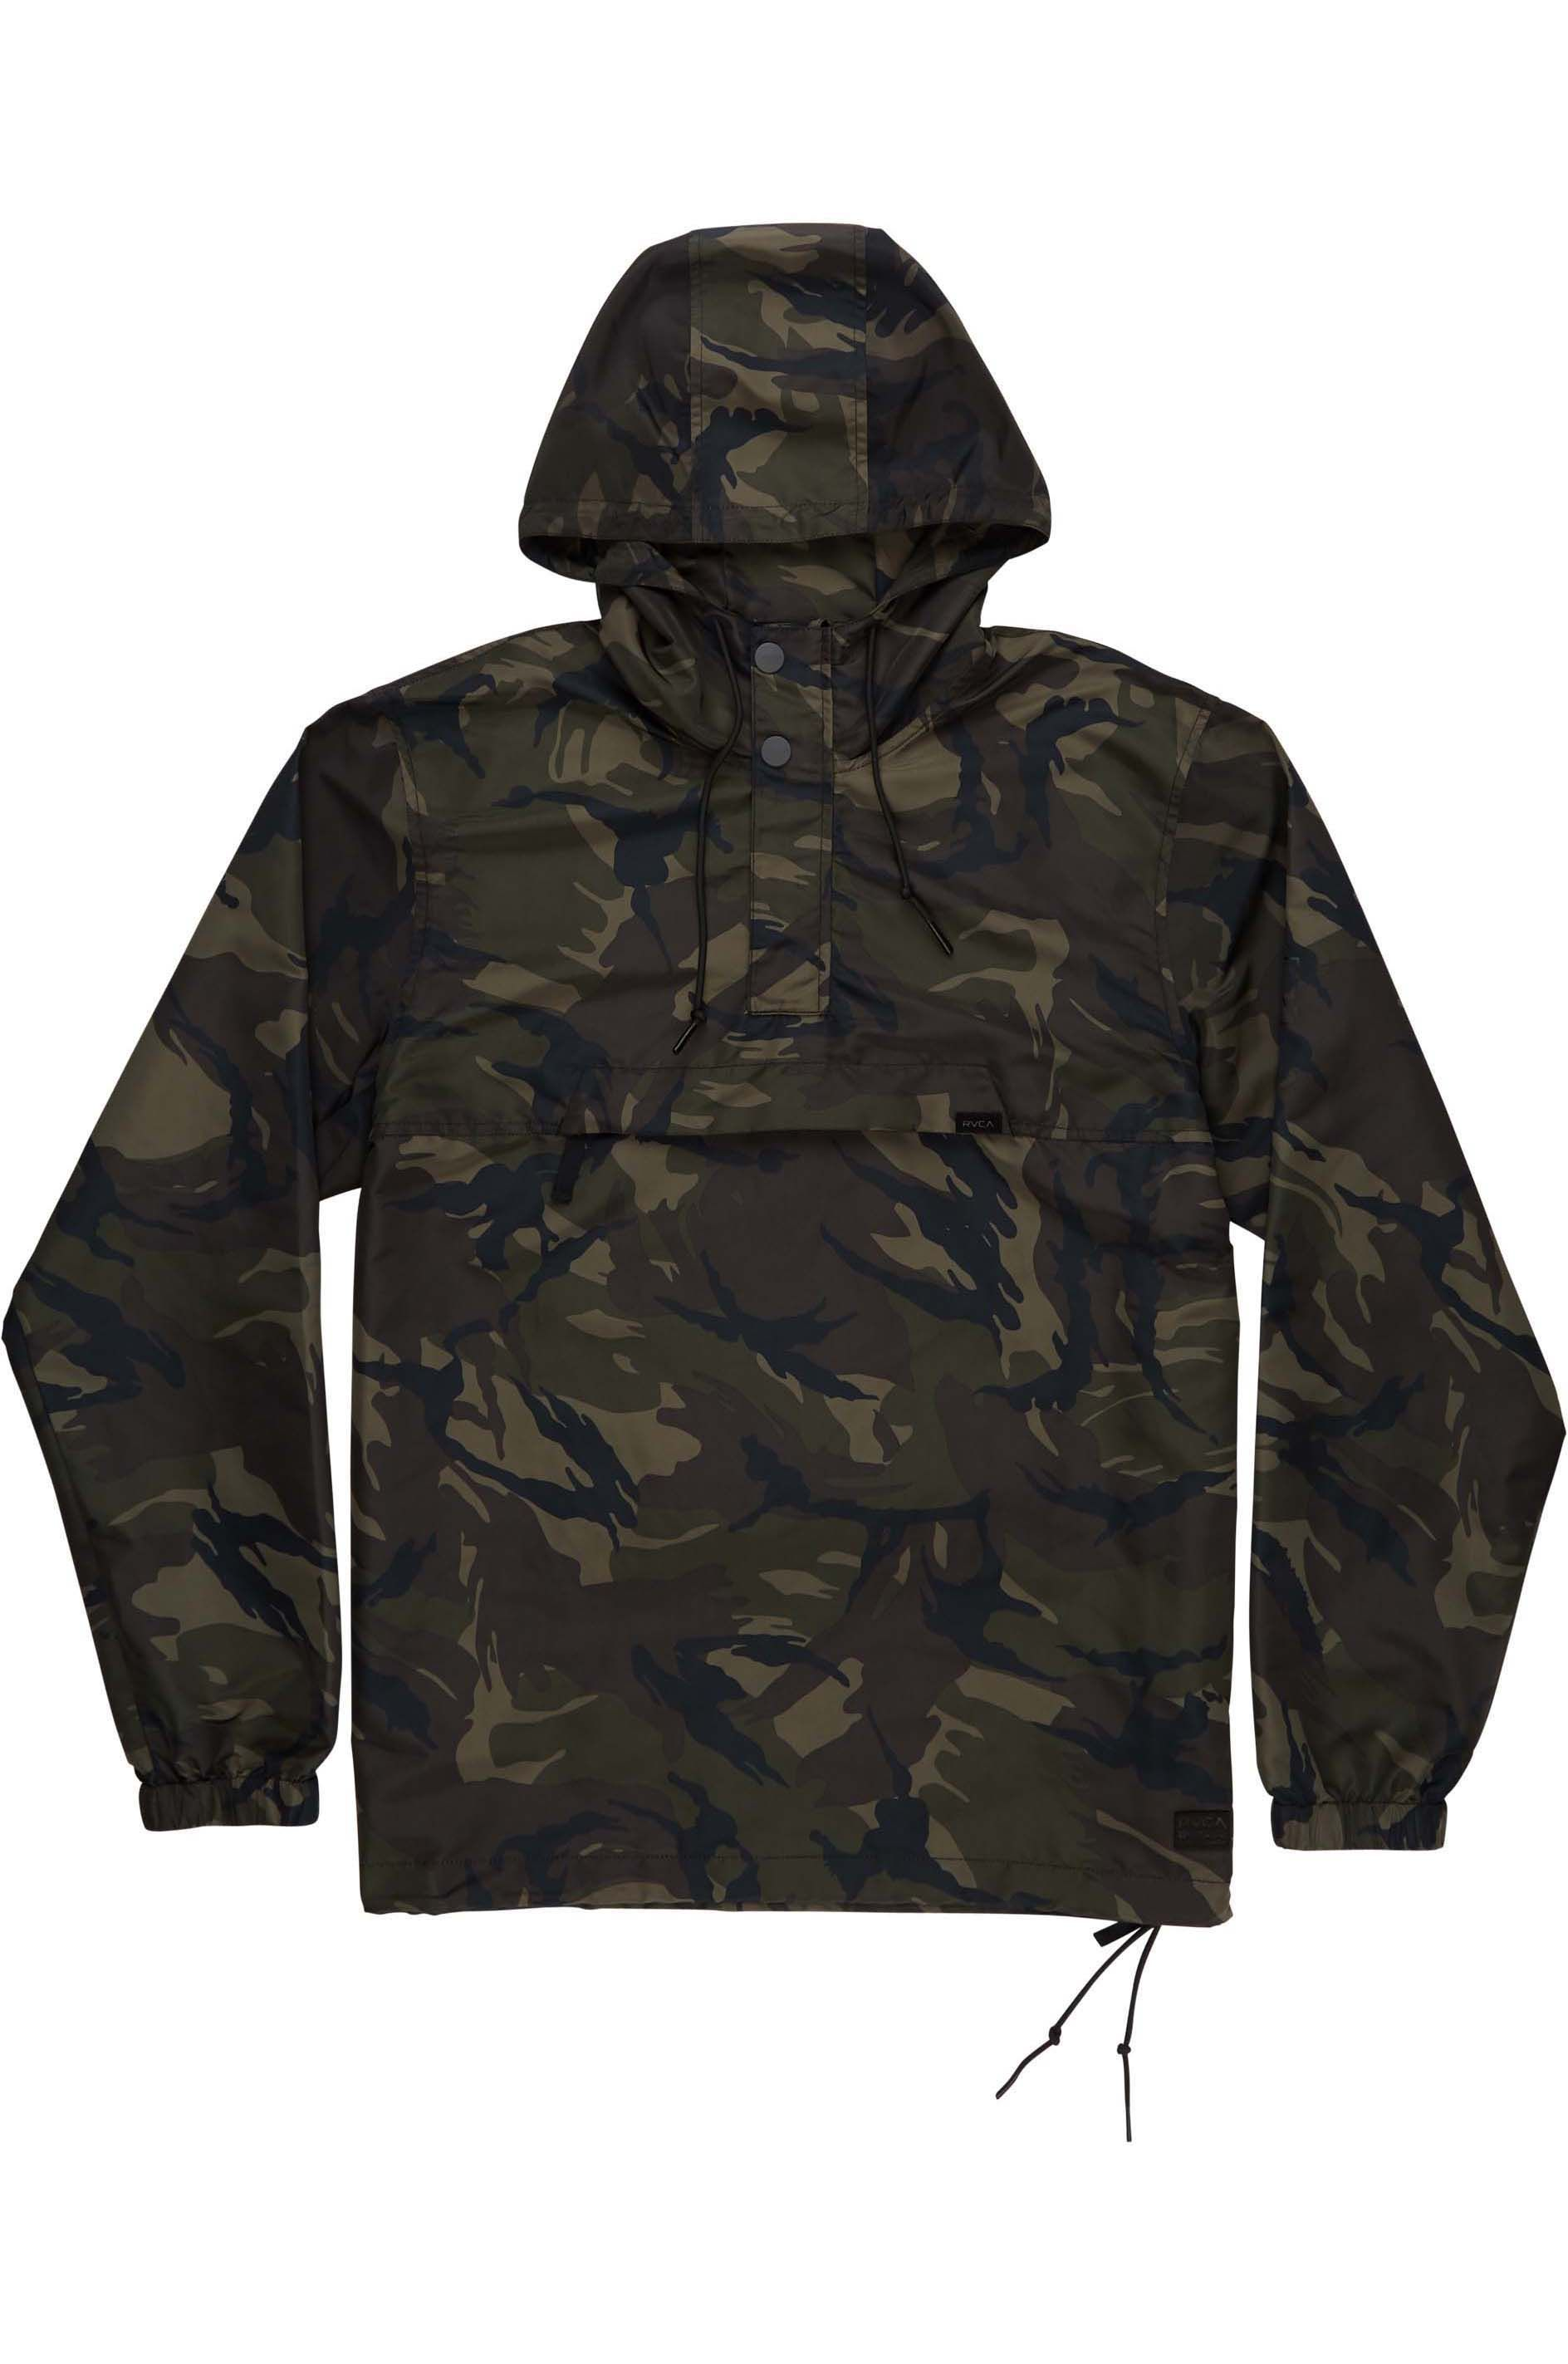 RVCA Jacket PACKAWAY ANORAK II Woodland Camo